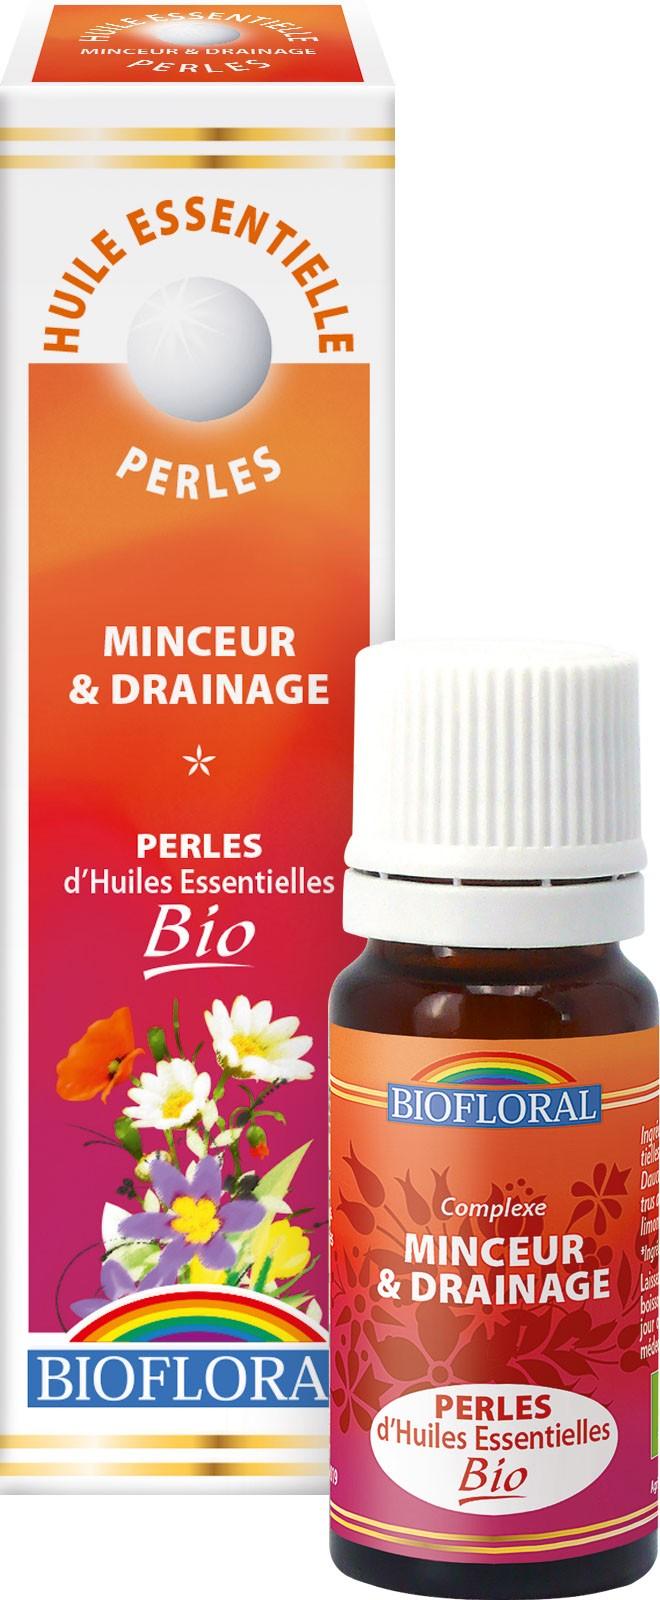 BIOFLORAL Huille essentielle Perles BIO Minceur et Drainage Aromathérapie 300 Perles Flacon 20 ML